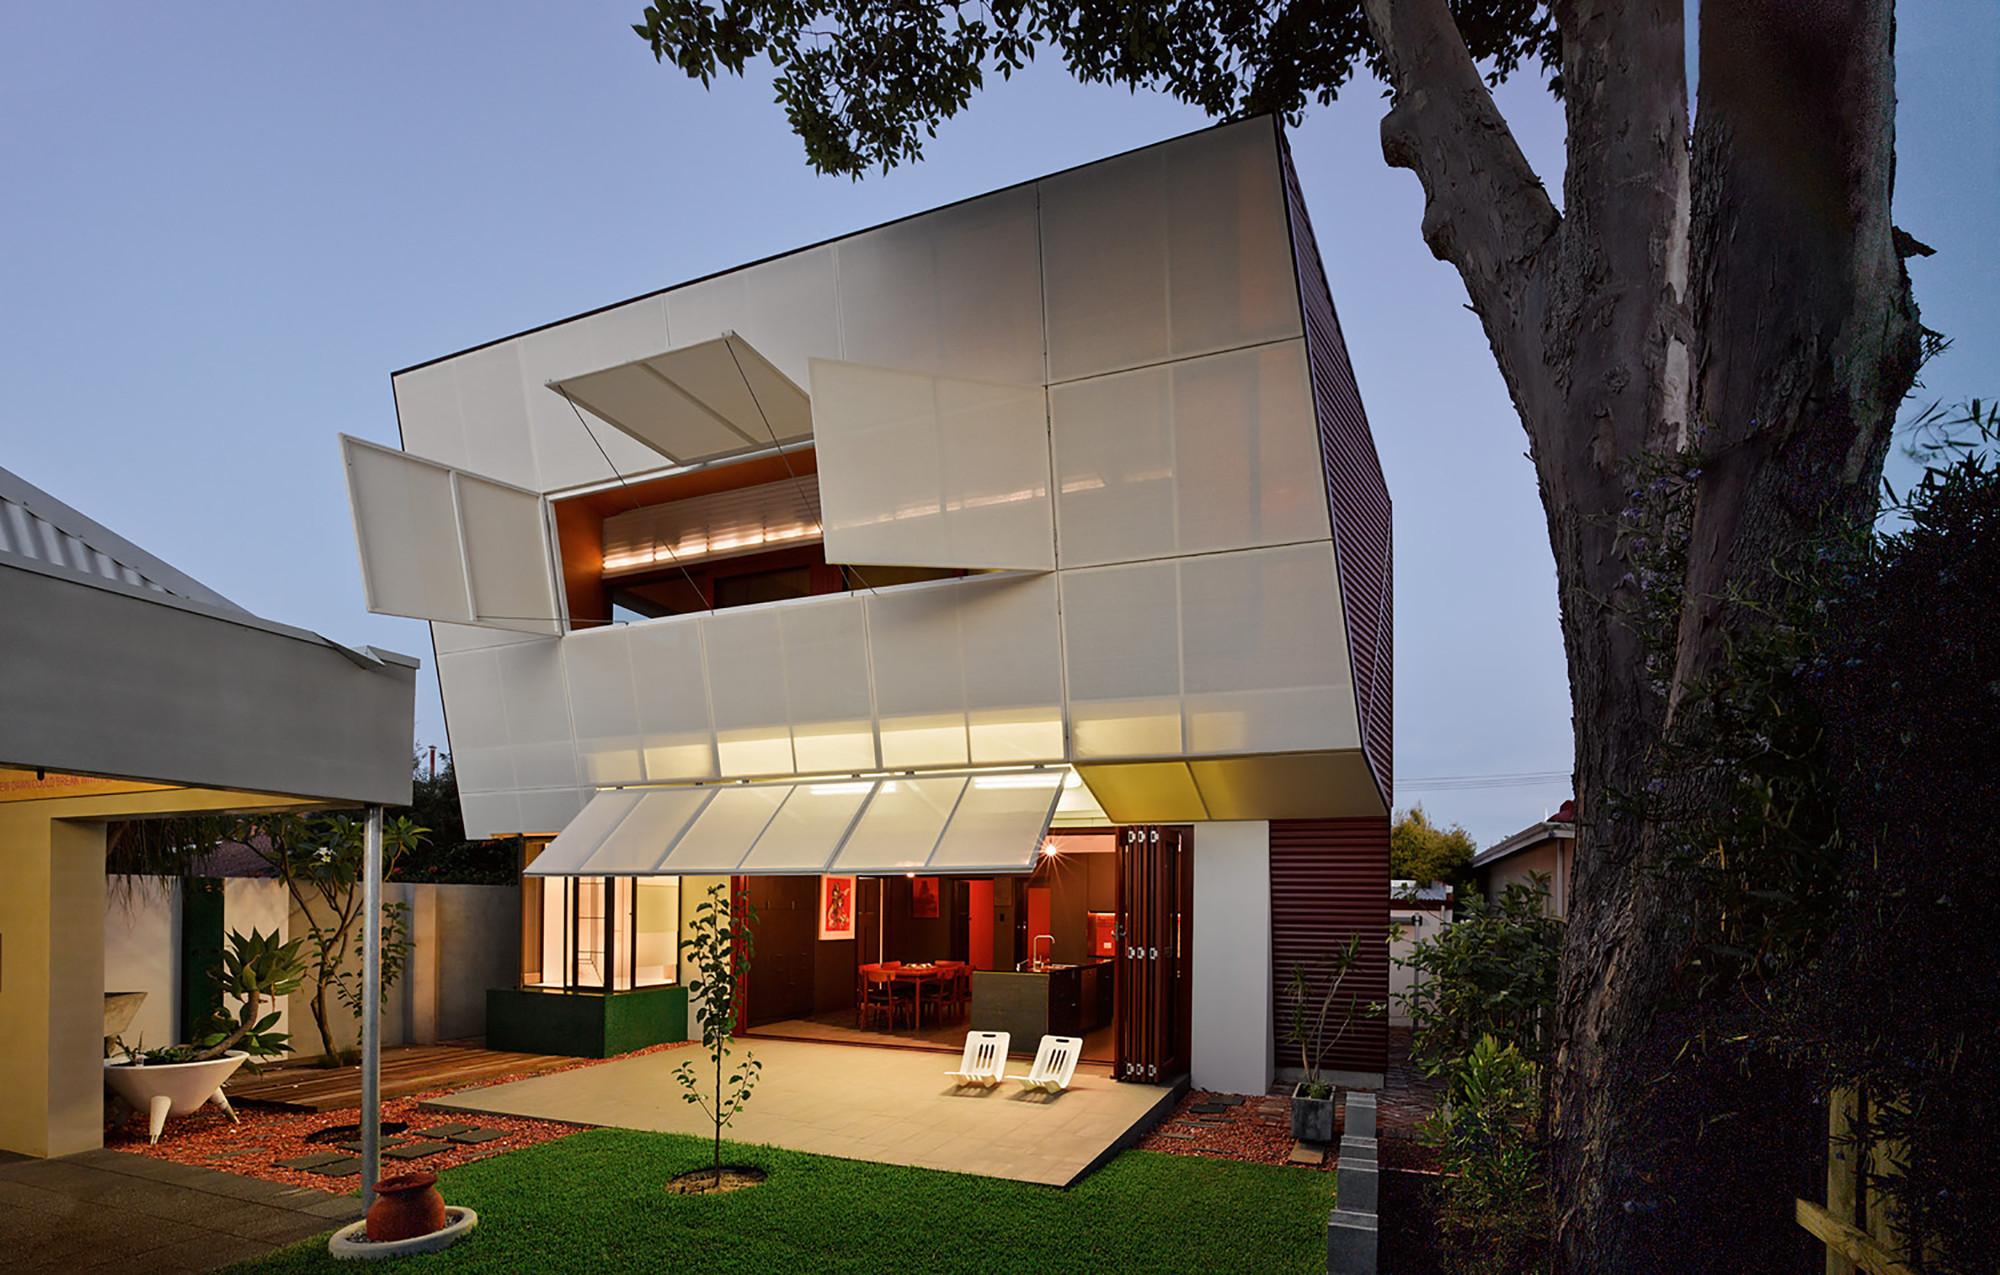 Casa 31_4 Room House / Caroline Di Costa Architect + Iredale Pedersen Hook Architects, © Peter Bennetts